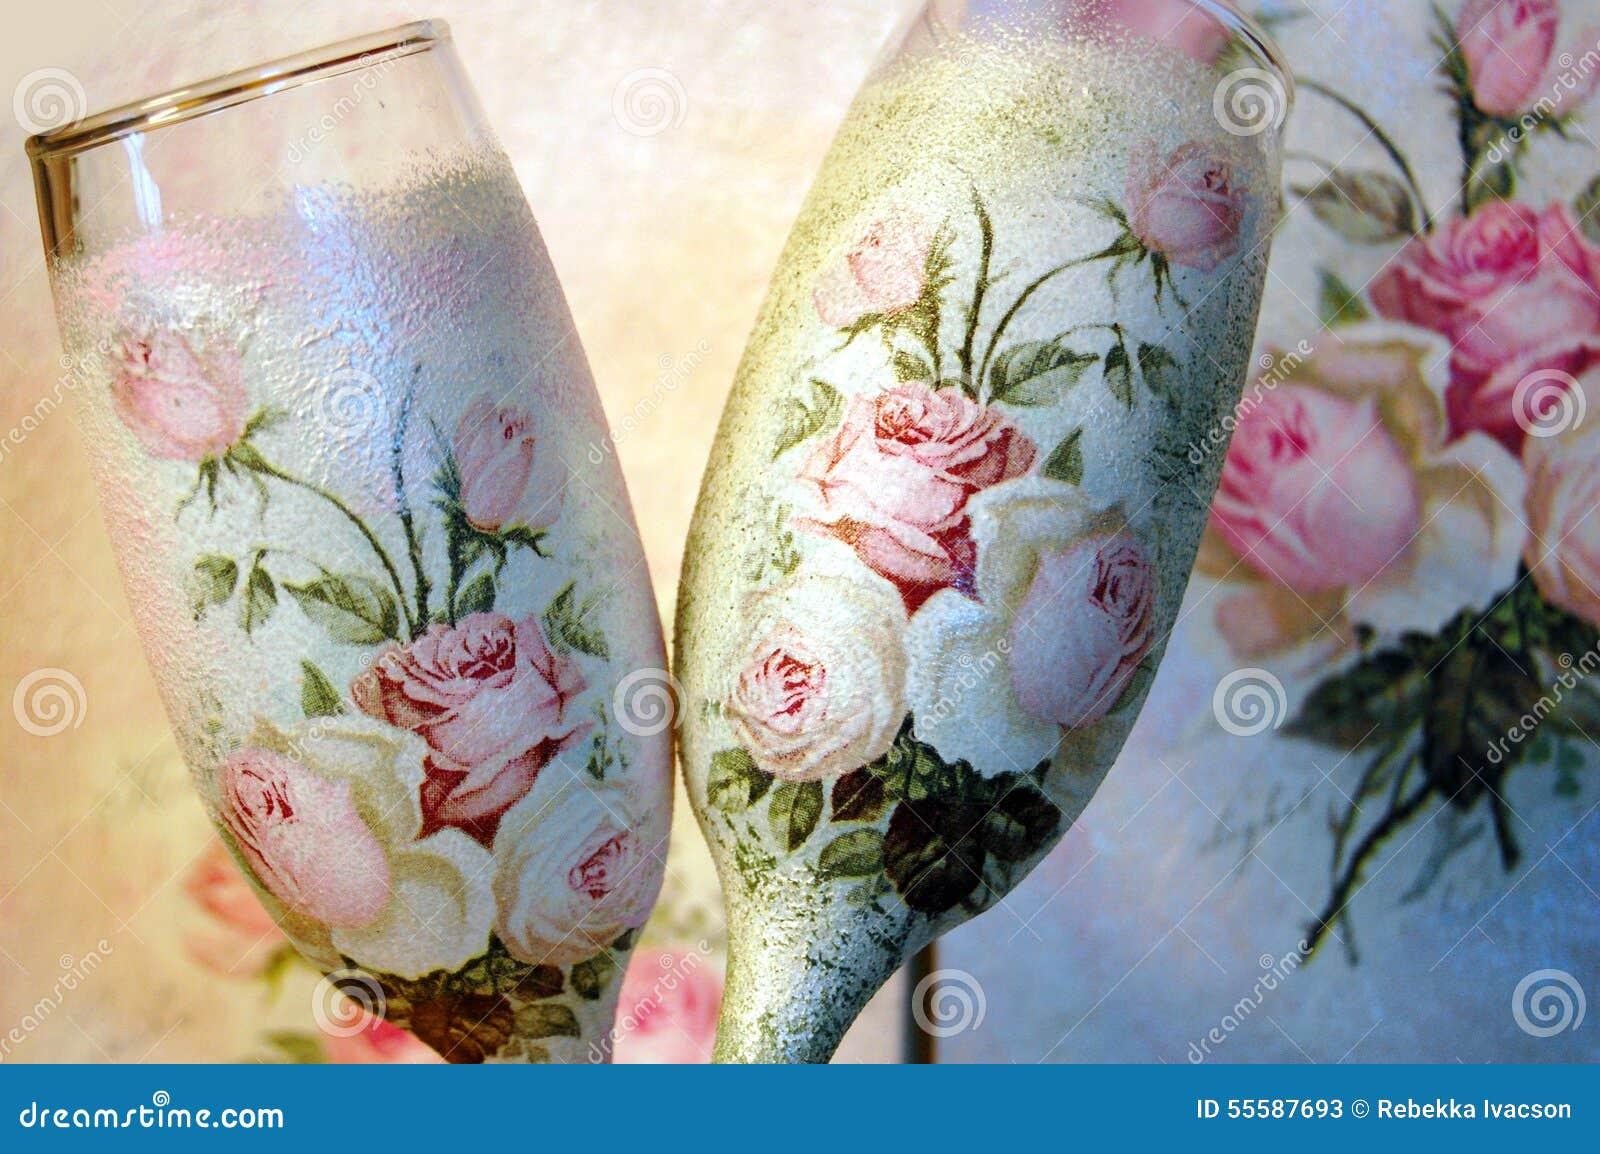 vintage decoupage decorated wineglasses stock image